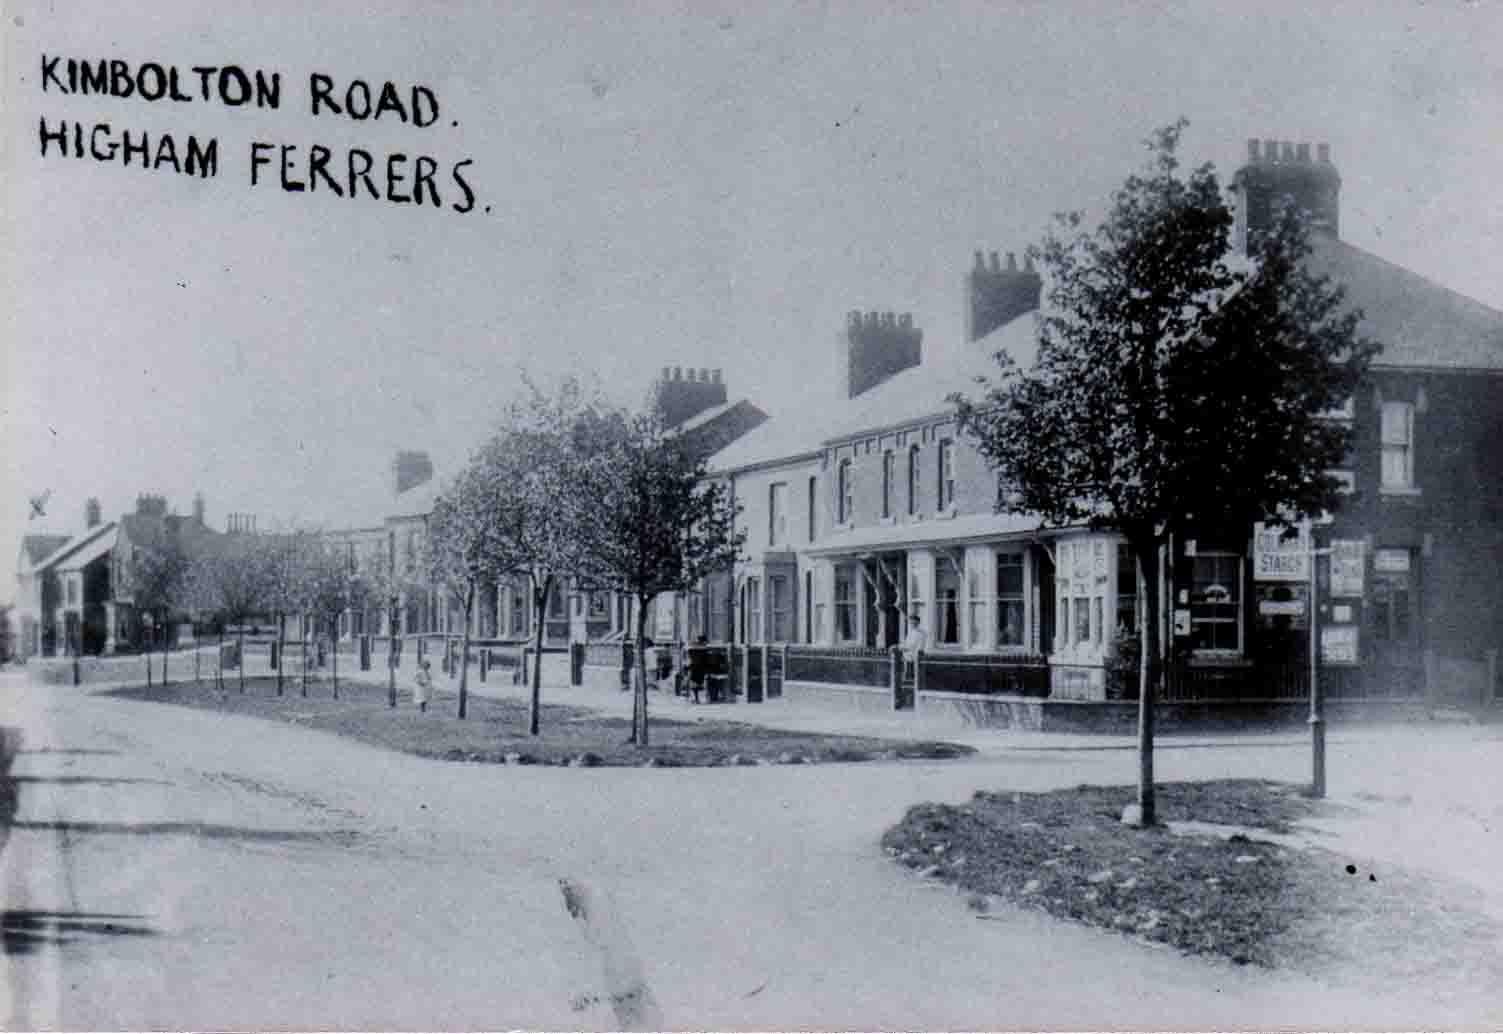 KimboltonRoad, Higham Ferrers, England